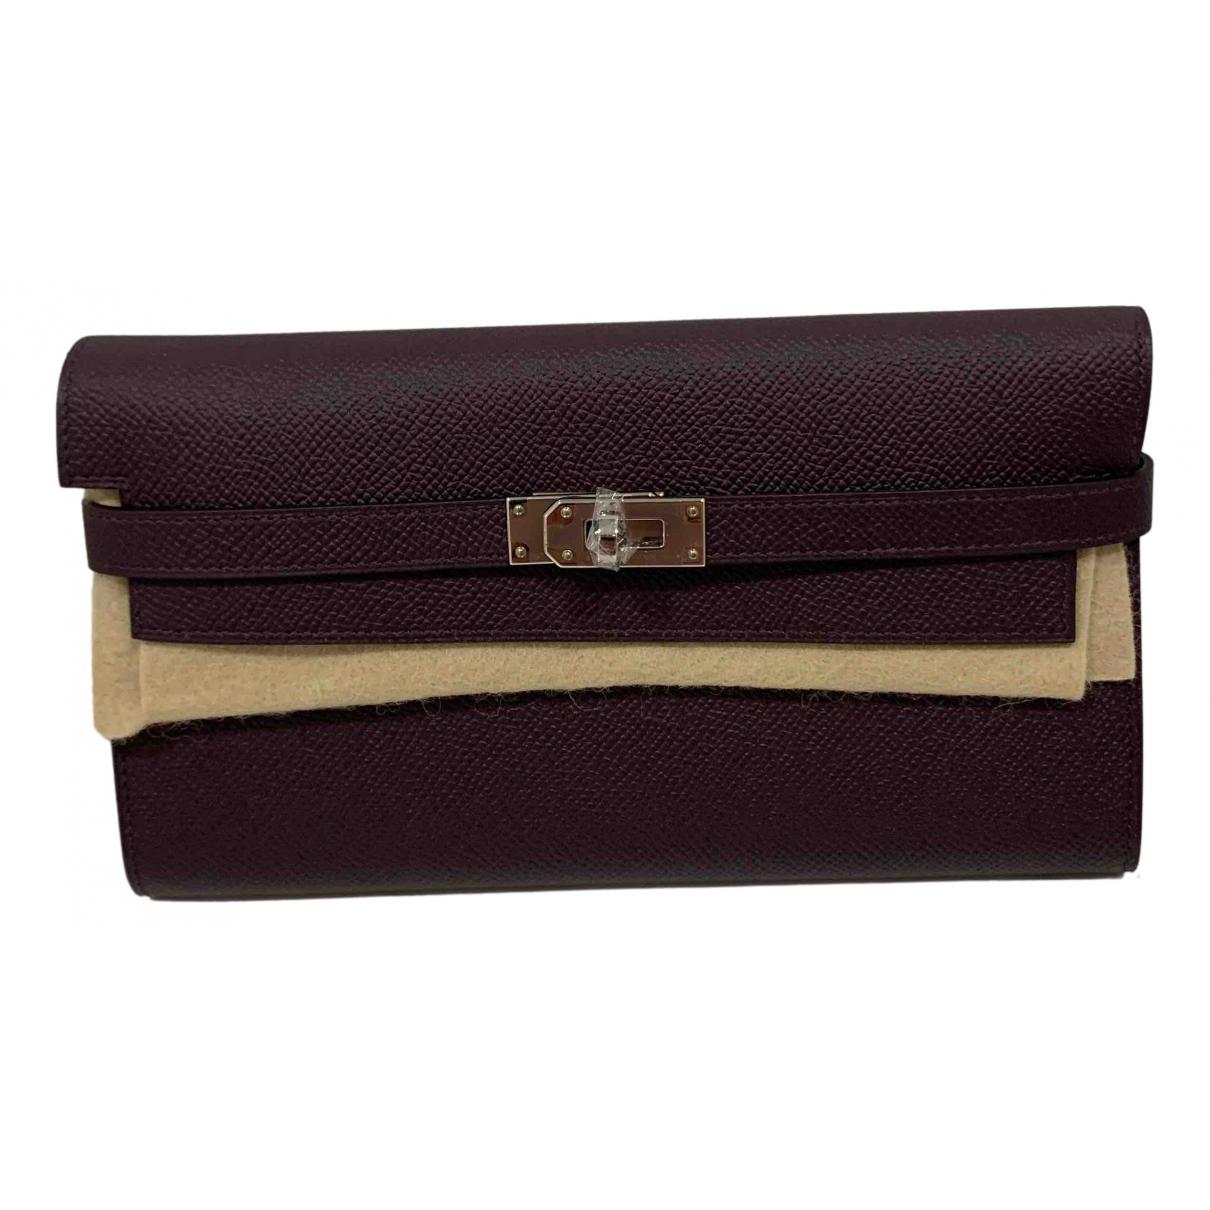 Hermes - Portefeuille Kelly pour femme en cuir - violet